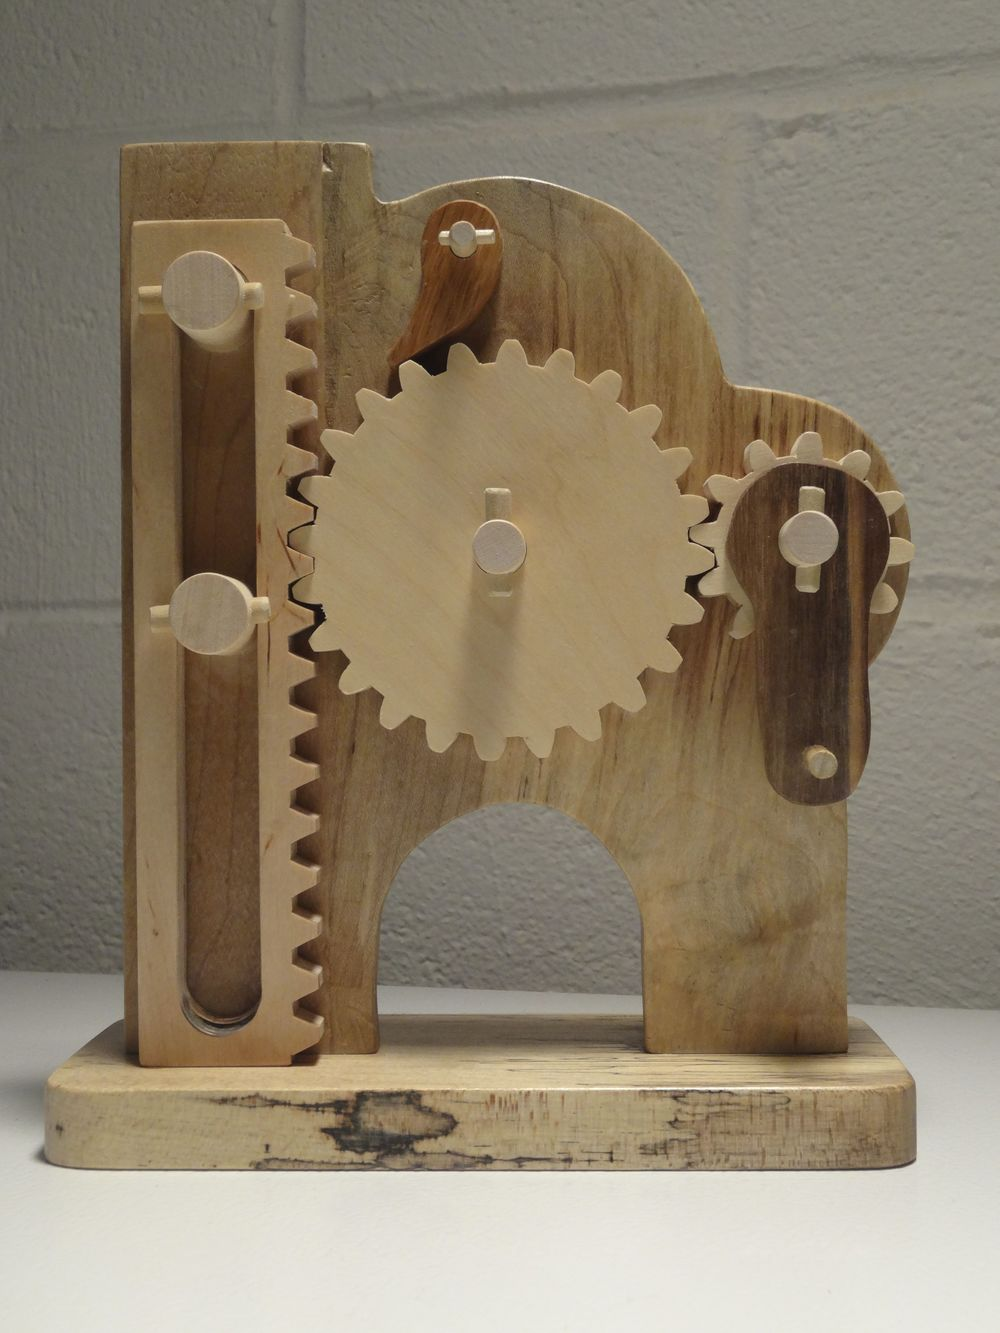 Screwjack Toy